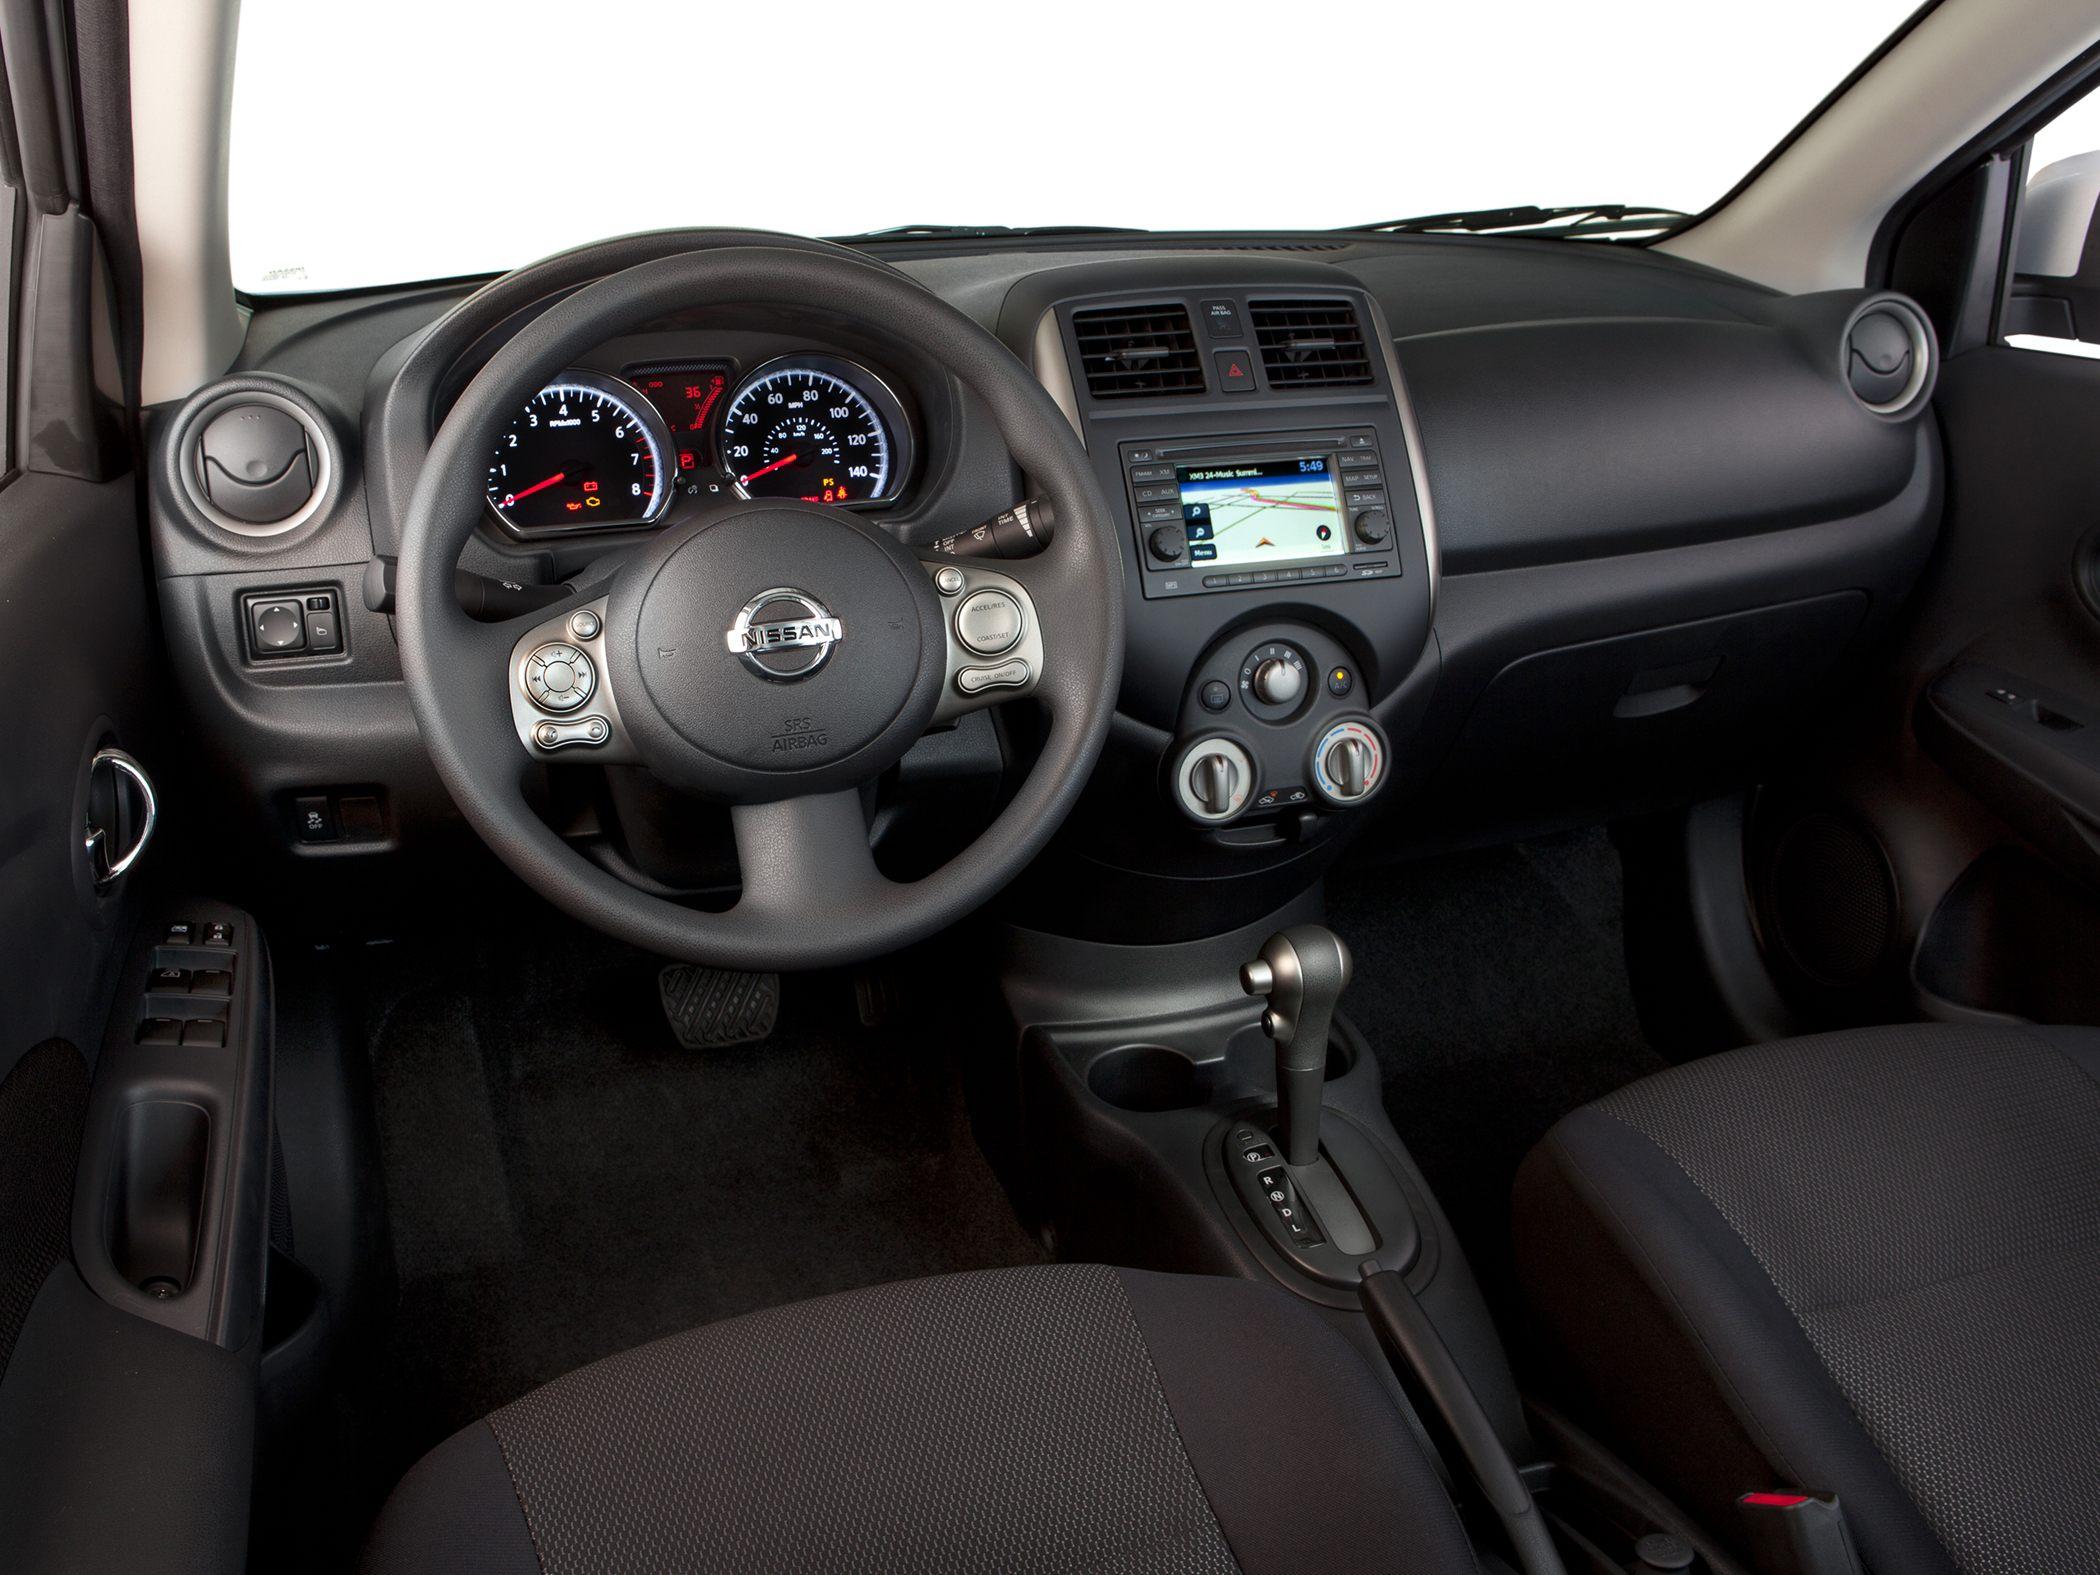 2013 Nissan Versa #11 Nissan Versa #11